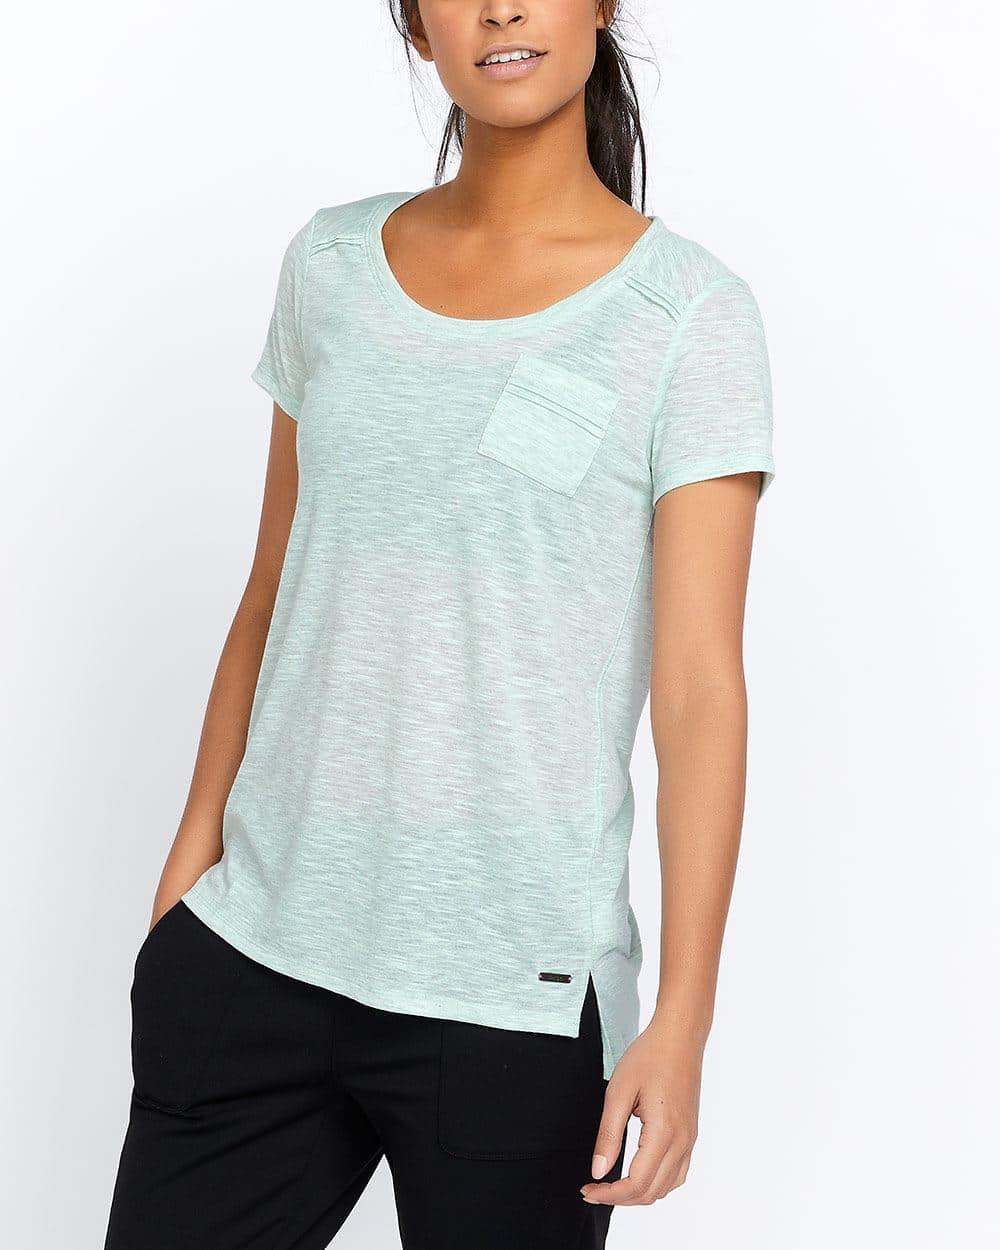 Hyba Pocket T-Shirt